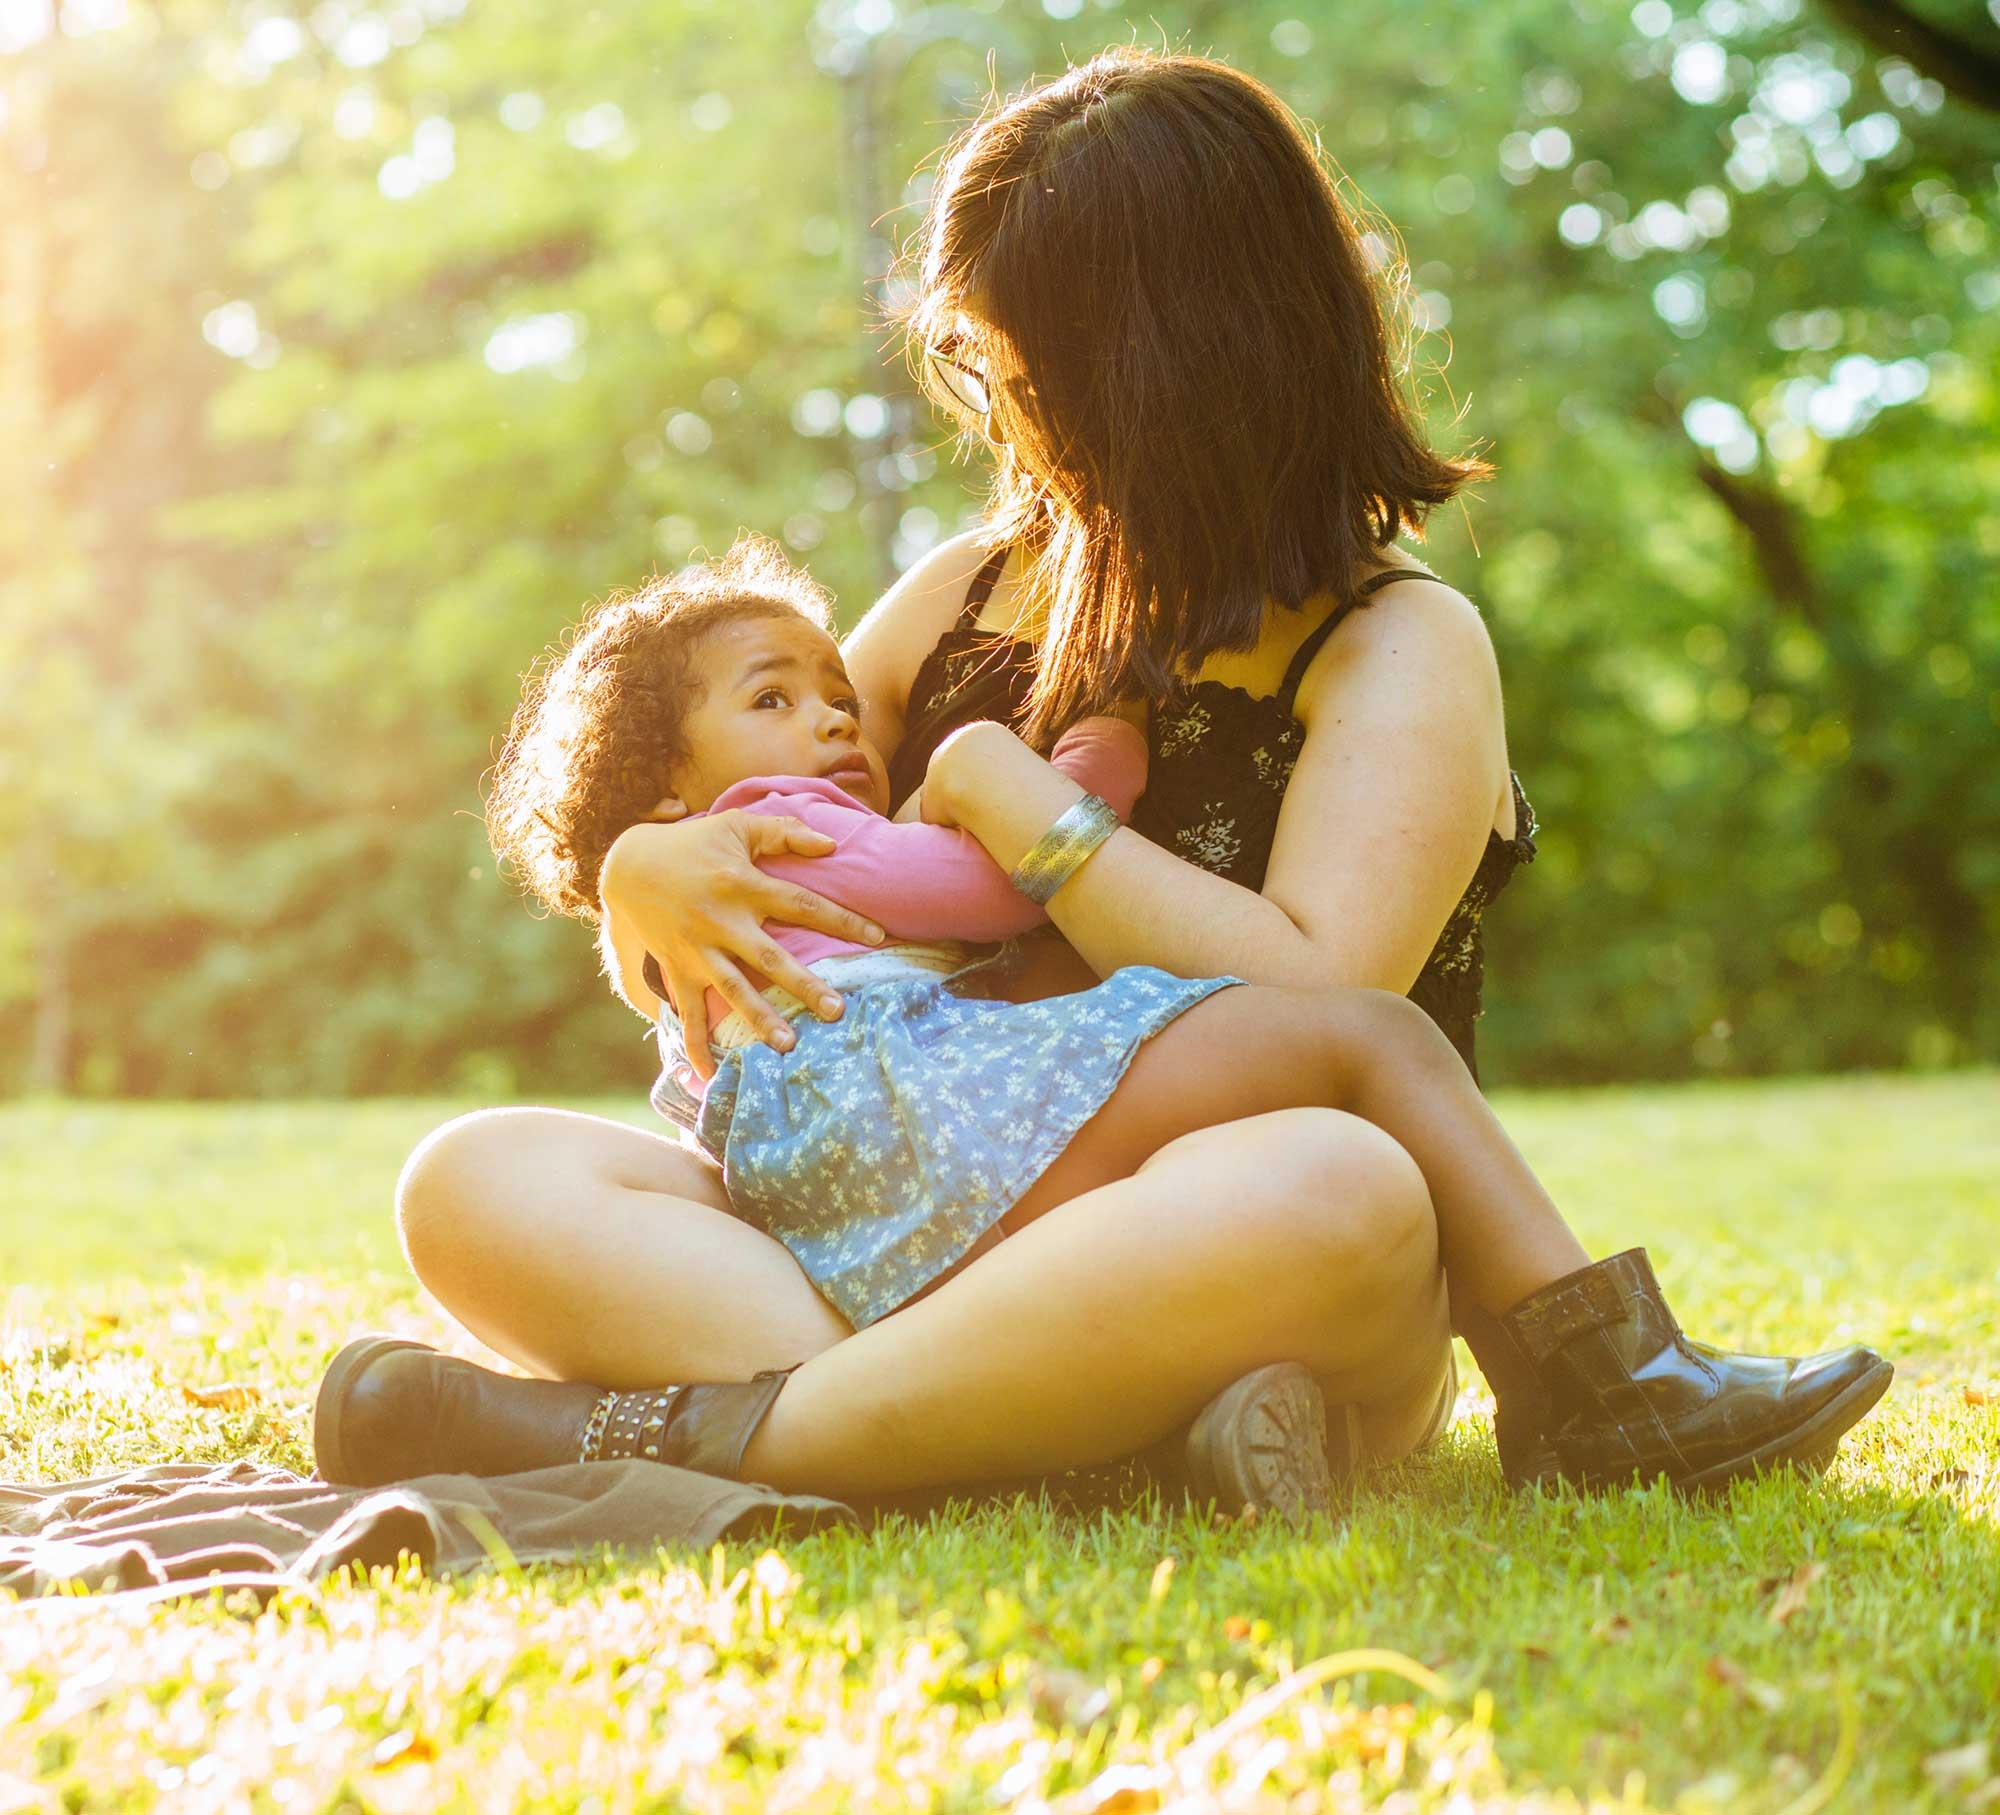 breastfeeding in the sun for vitamin D